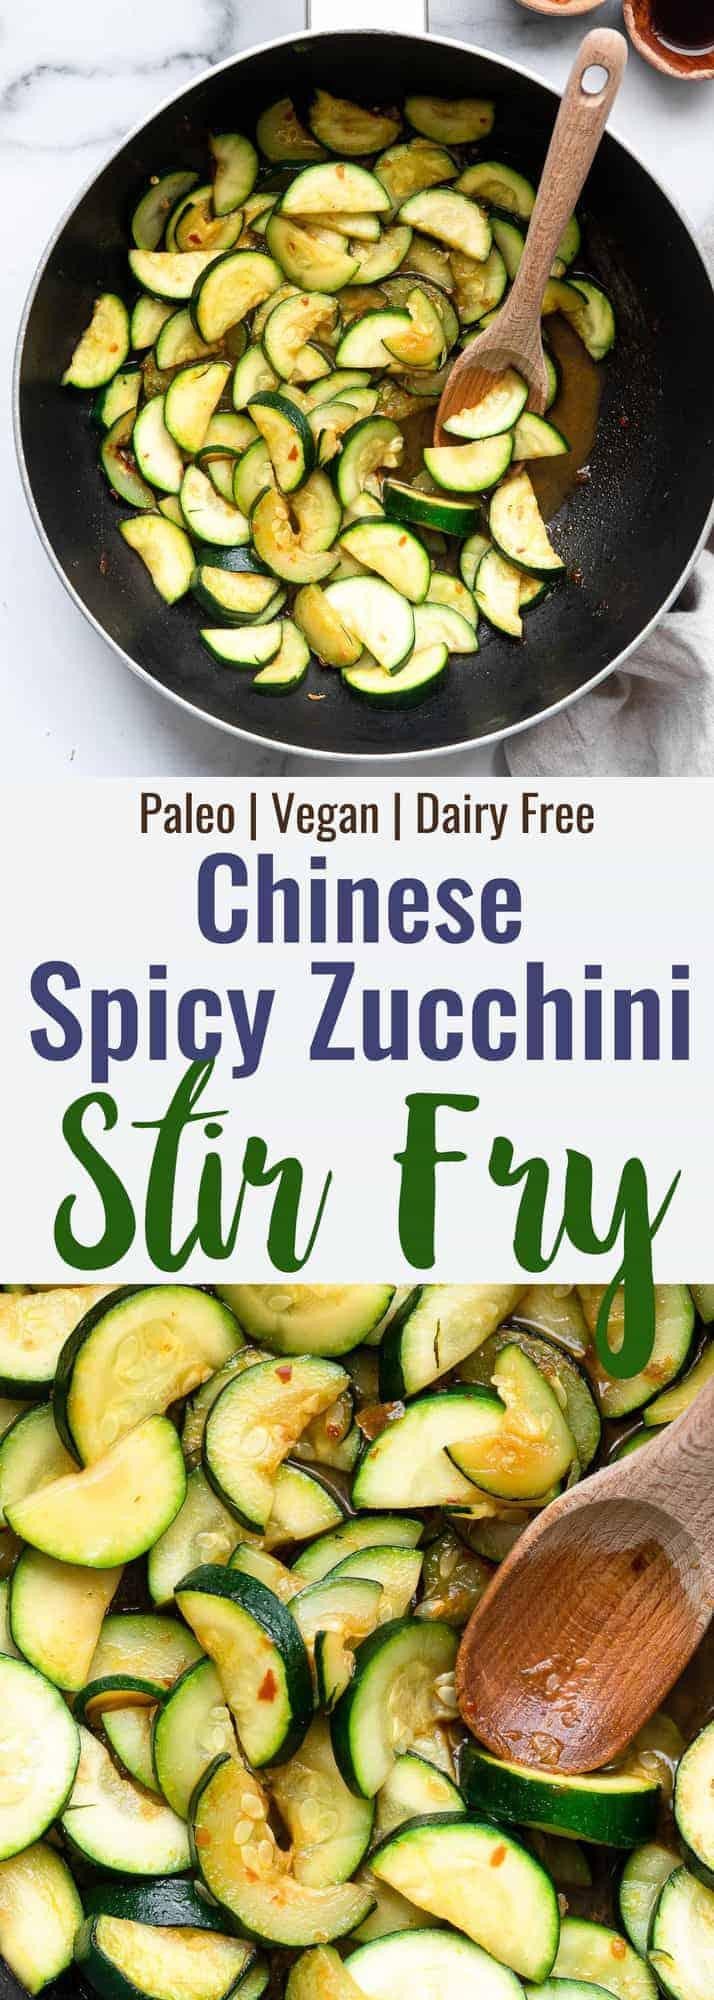 Zucchinistir fry collage photo